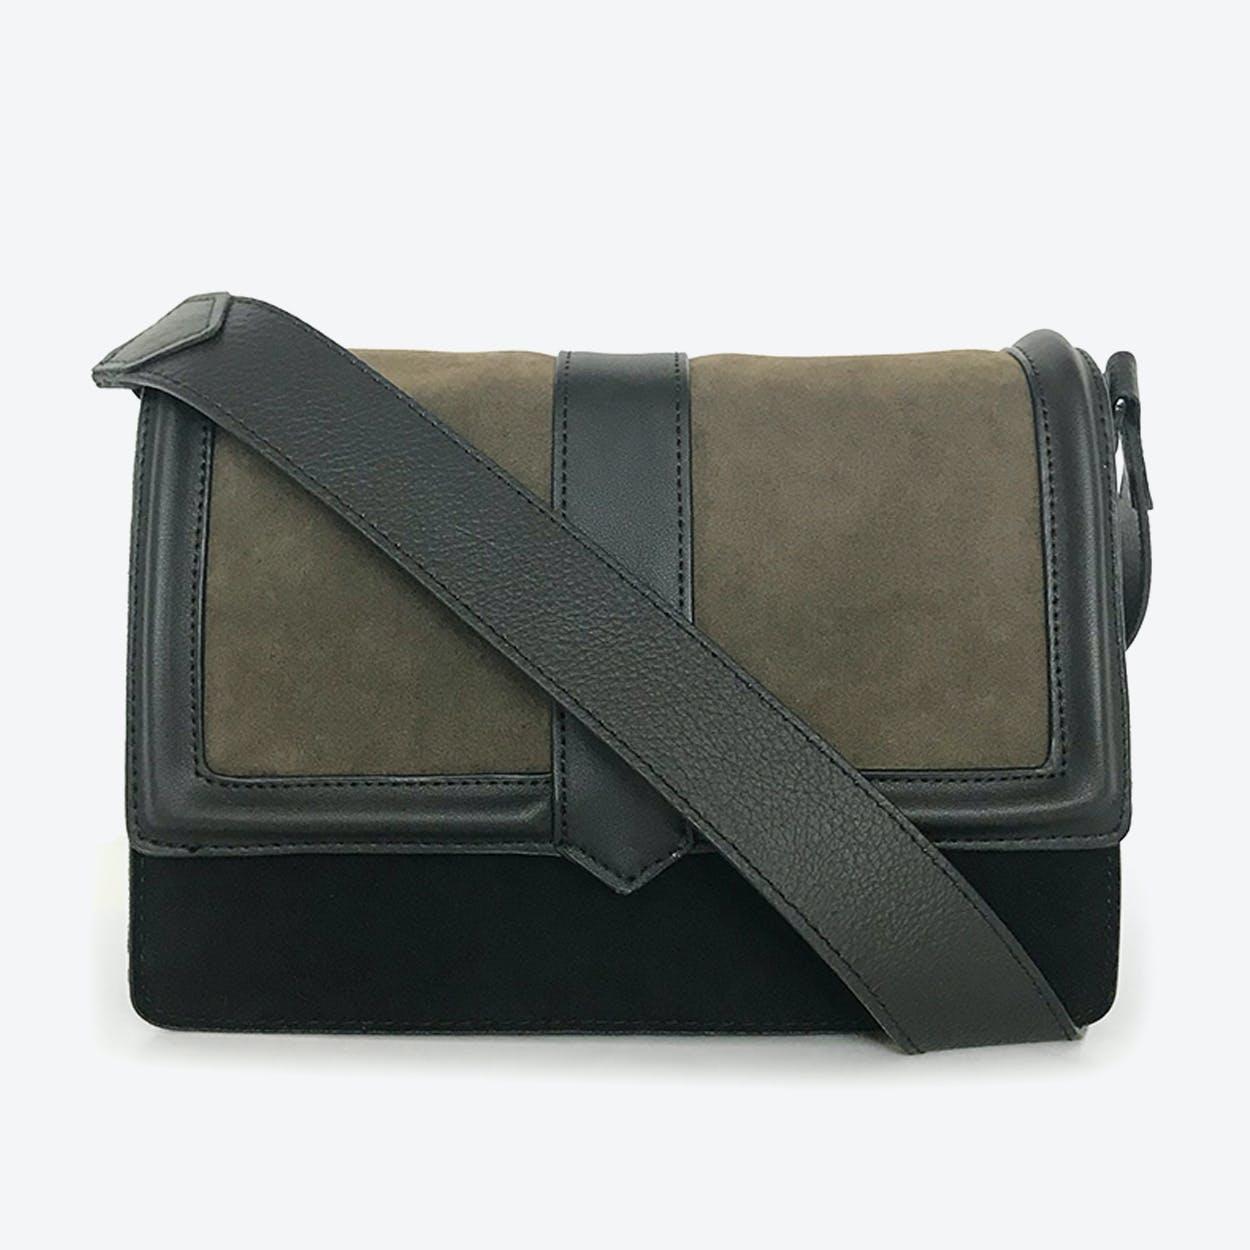 Laval 5 - Crossbody Bag